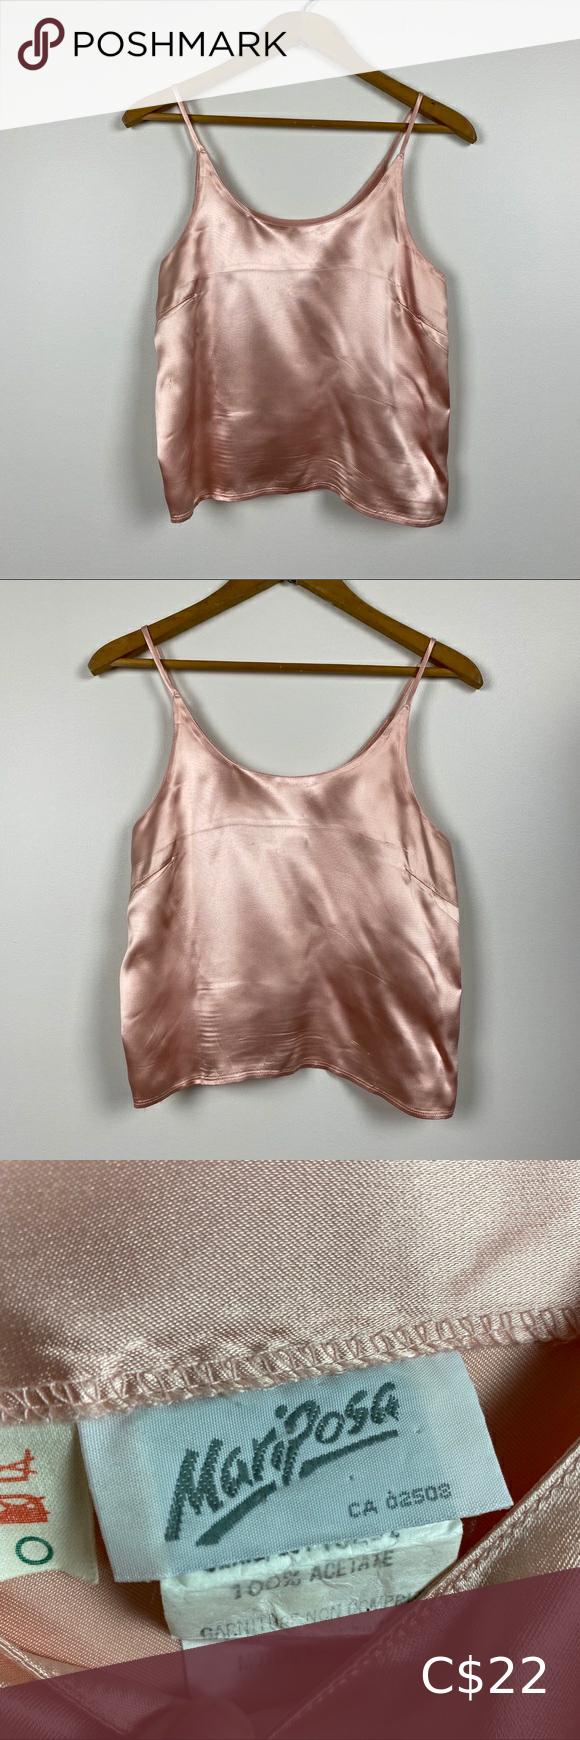 Vintage Blush Pink Satin Camisole Top